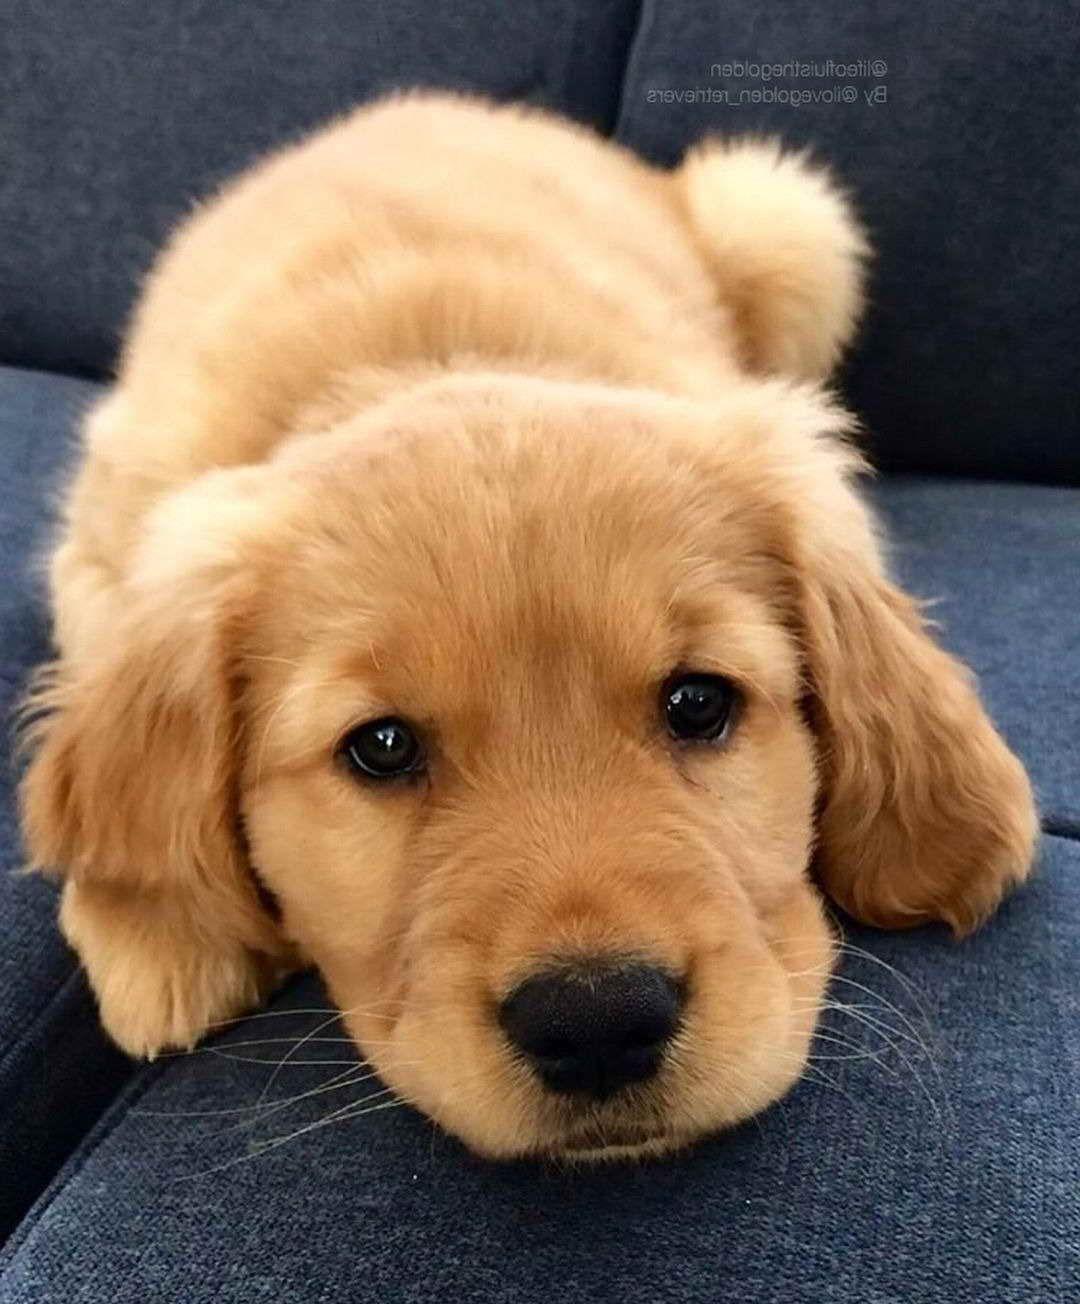 Baby Golden Retriever Golden Retriever Baby Dogs Golden Retriever Cute Dogs